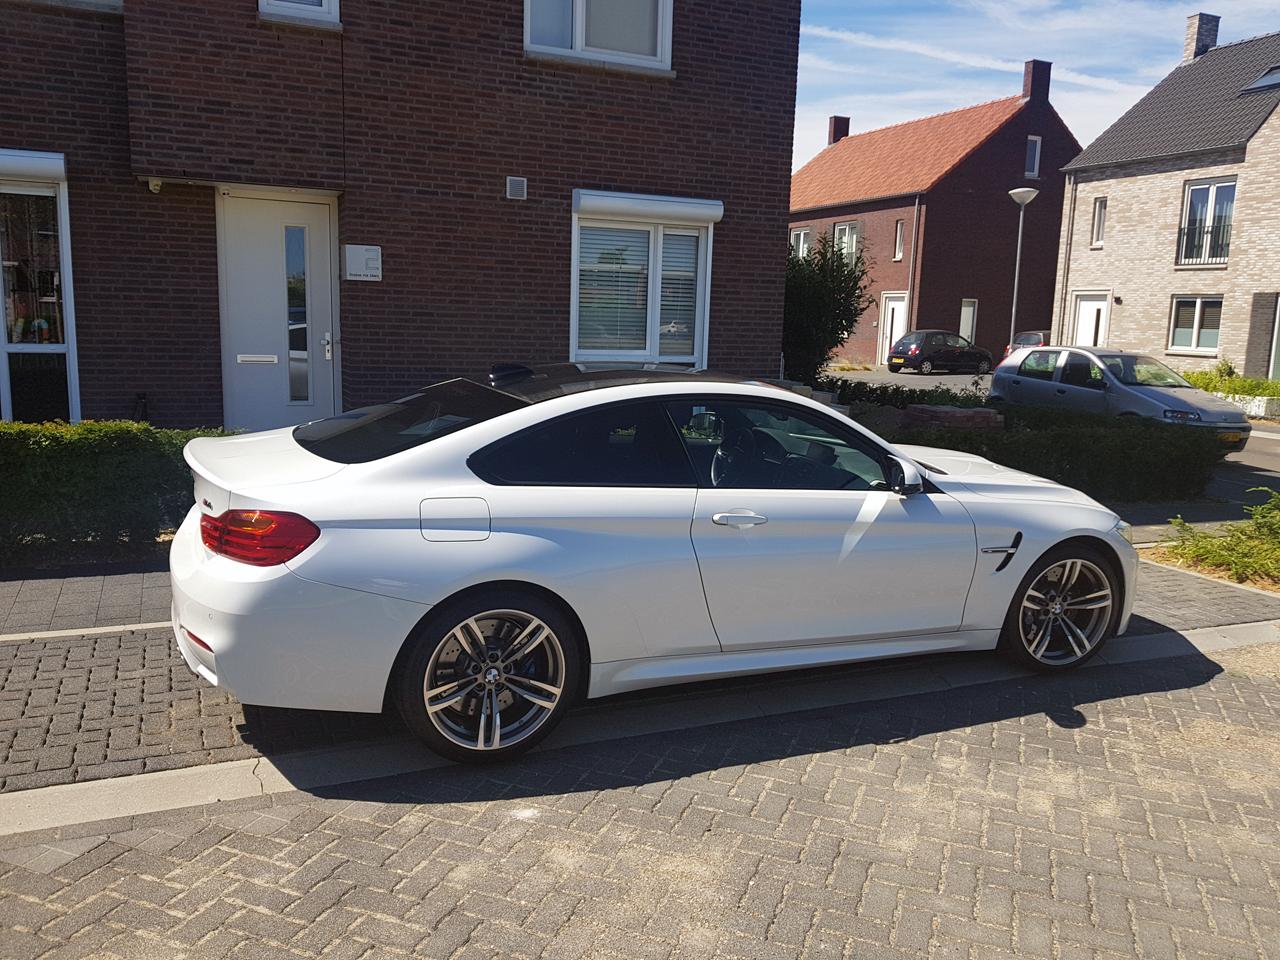 BMW_M4_white_1.jpg